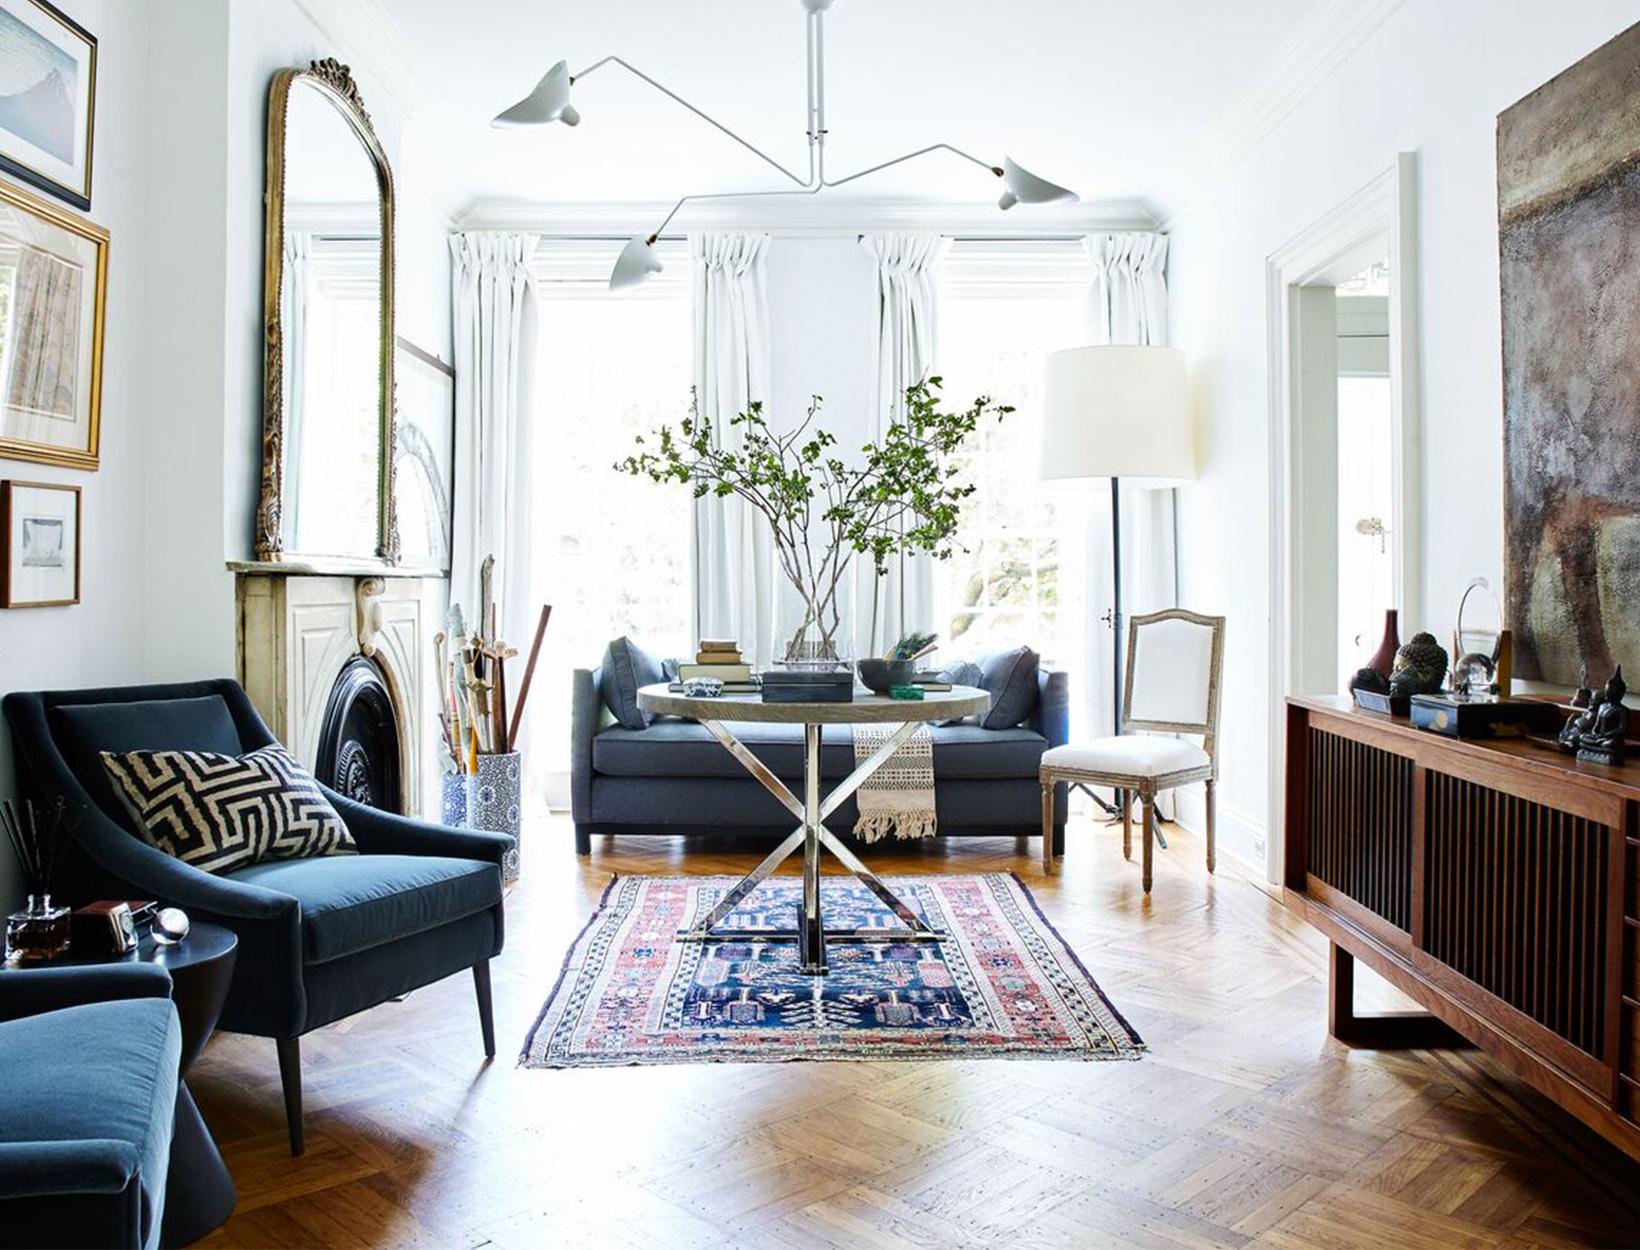 Tips for Making a Living Room Feel More Livable  Goop